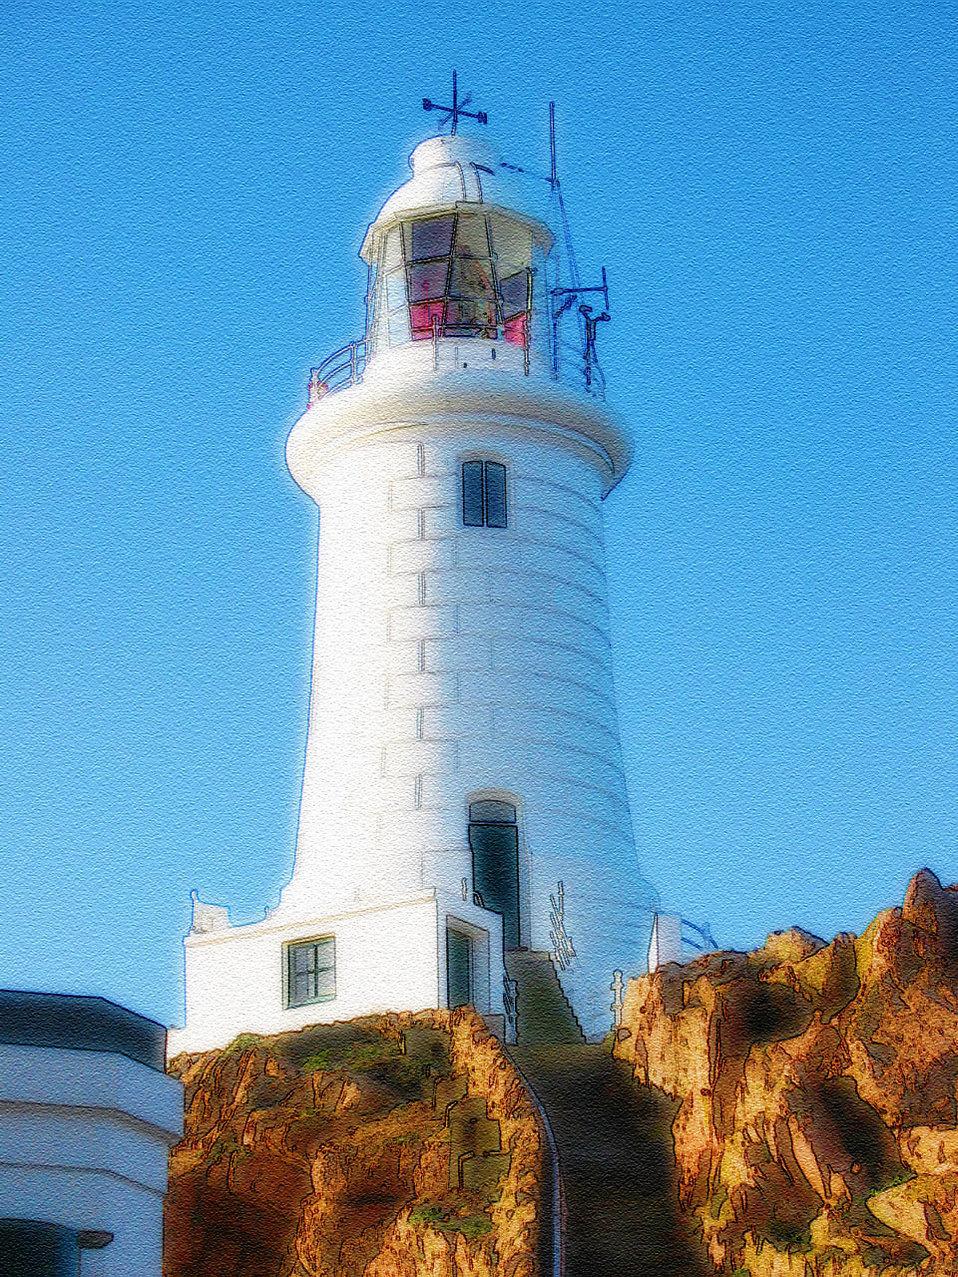 Lighthouses Free Stock Photo Illustration Of A White